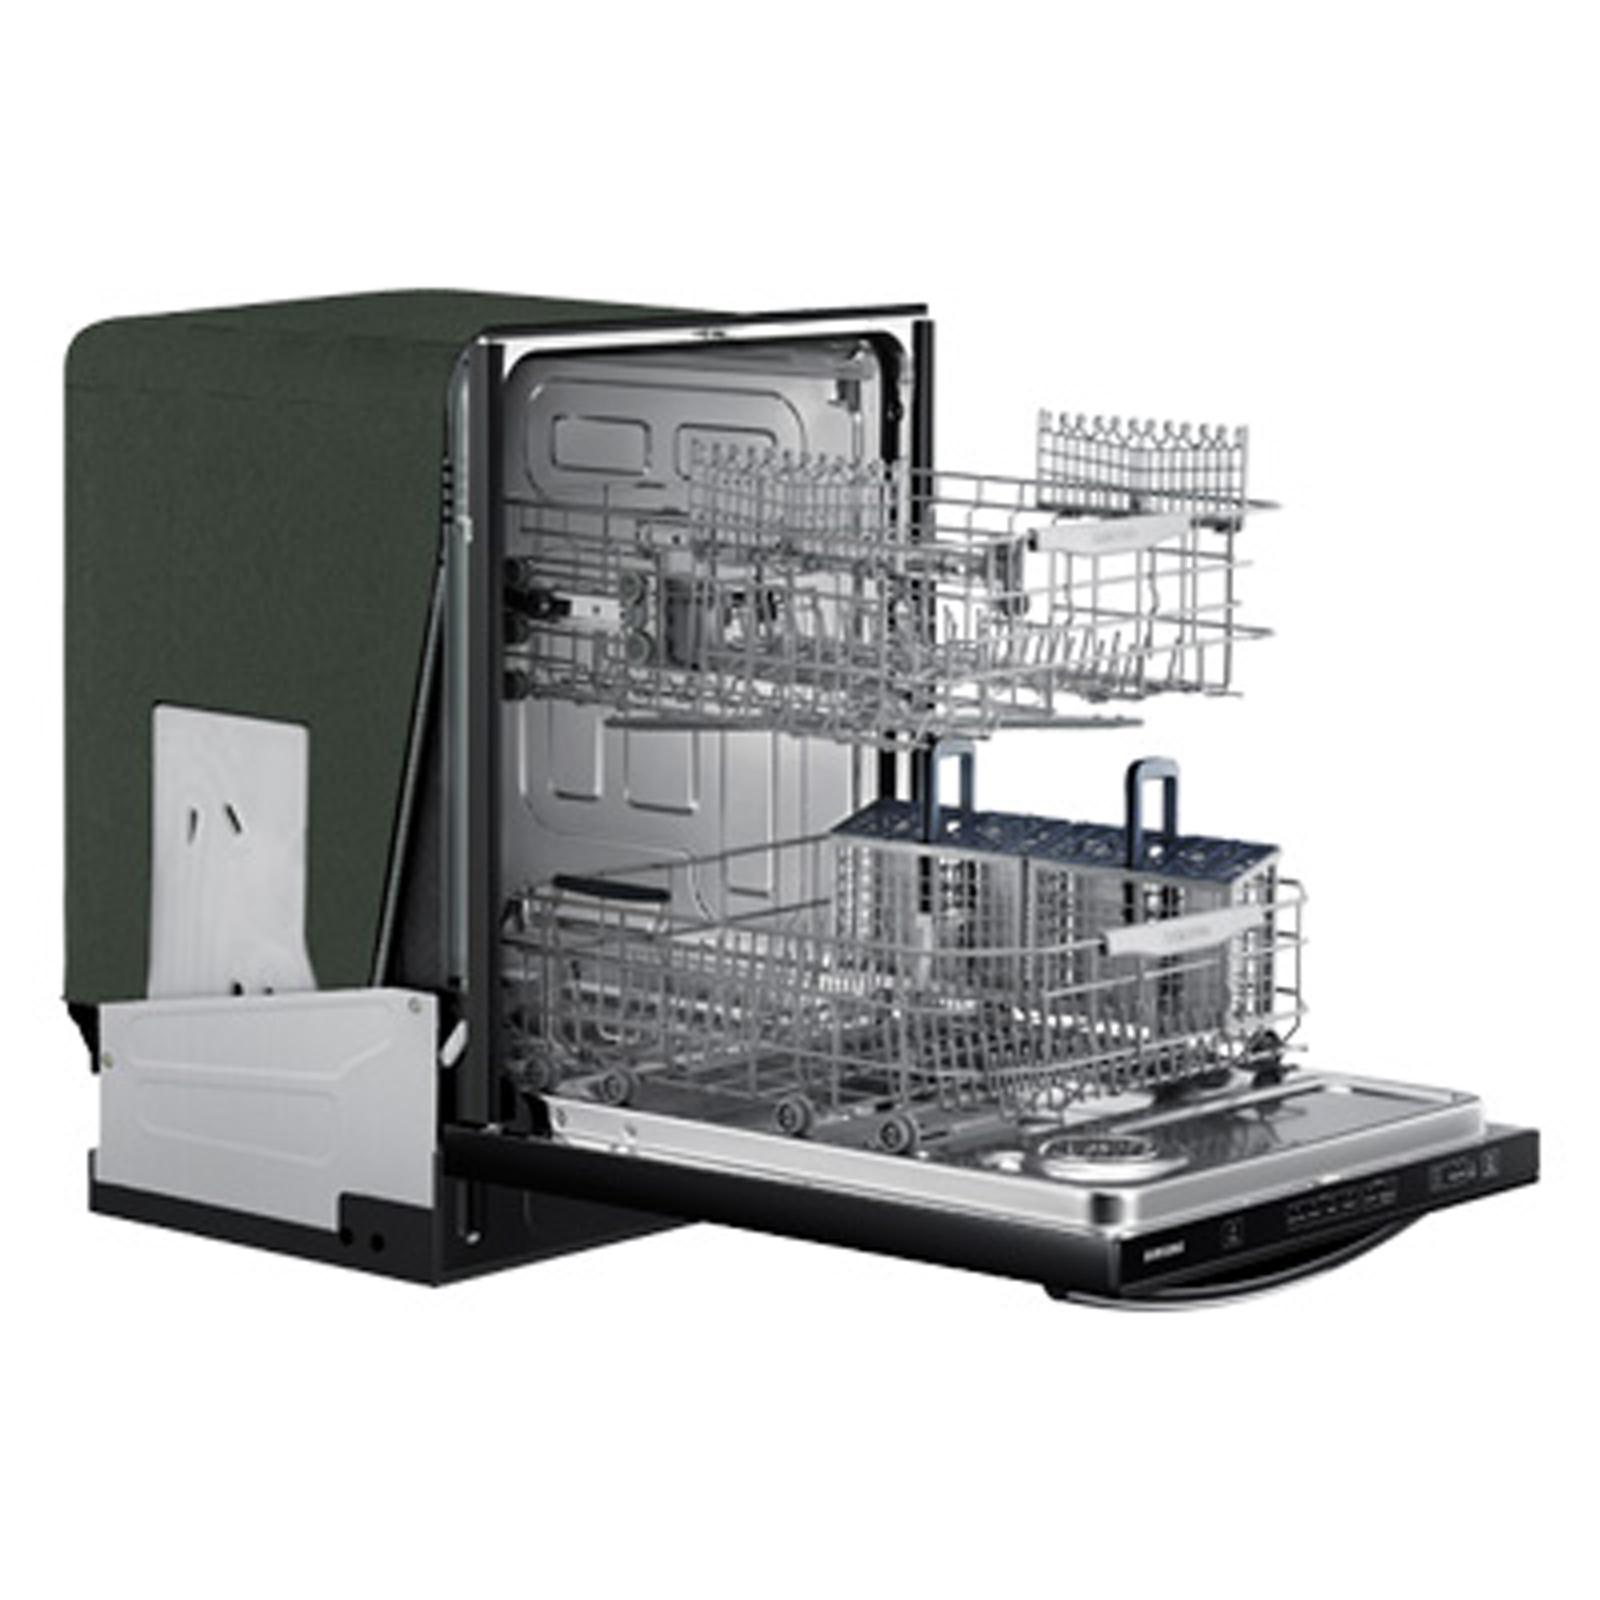 "Samsung 24"" Built-In Dishwasher w/ Stainless Steel Tub - Black"